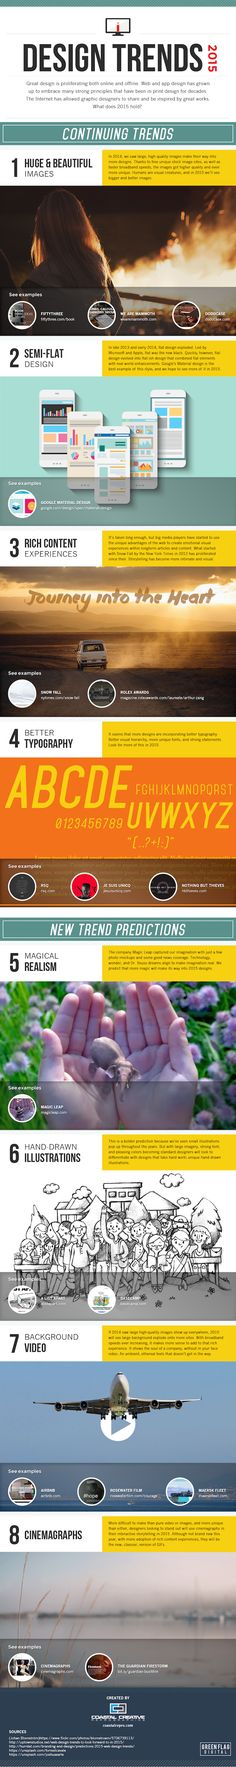 Design Trends for 2015 [Infographic], via @HubSpot